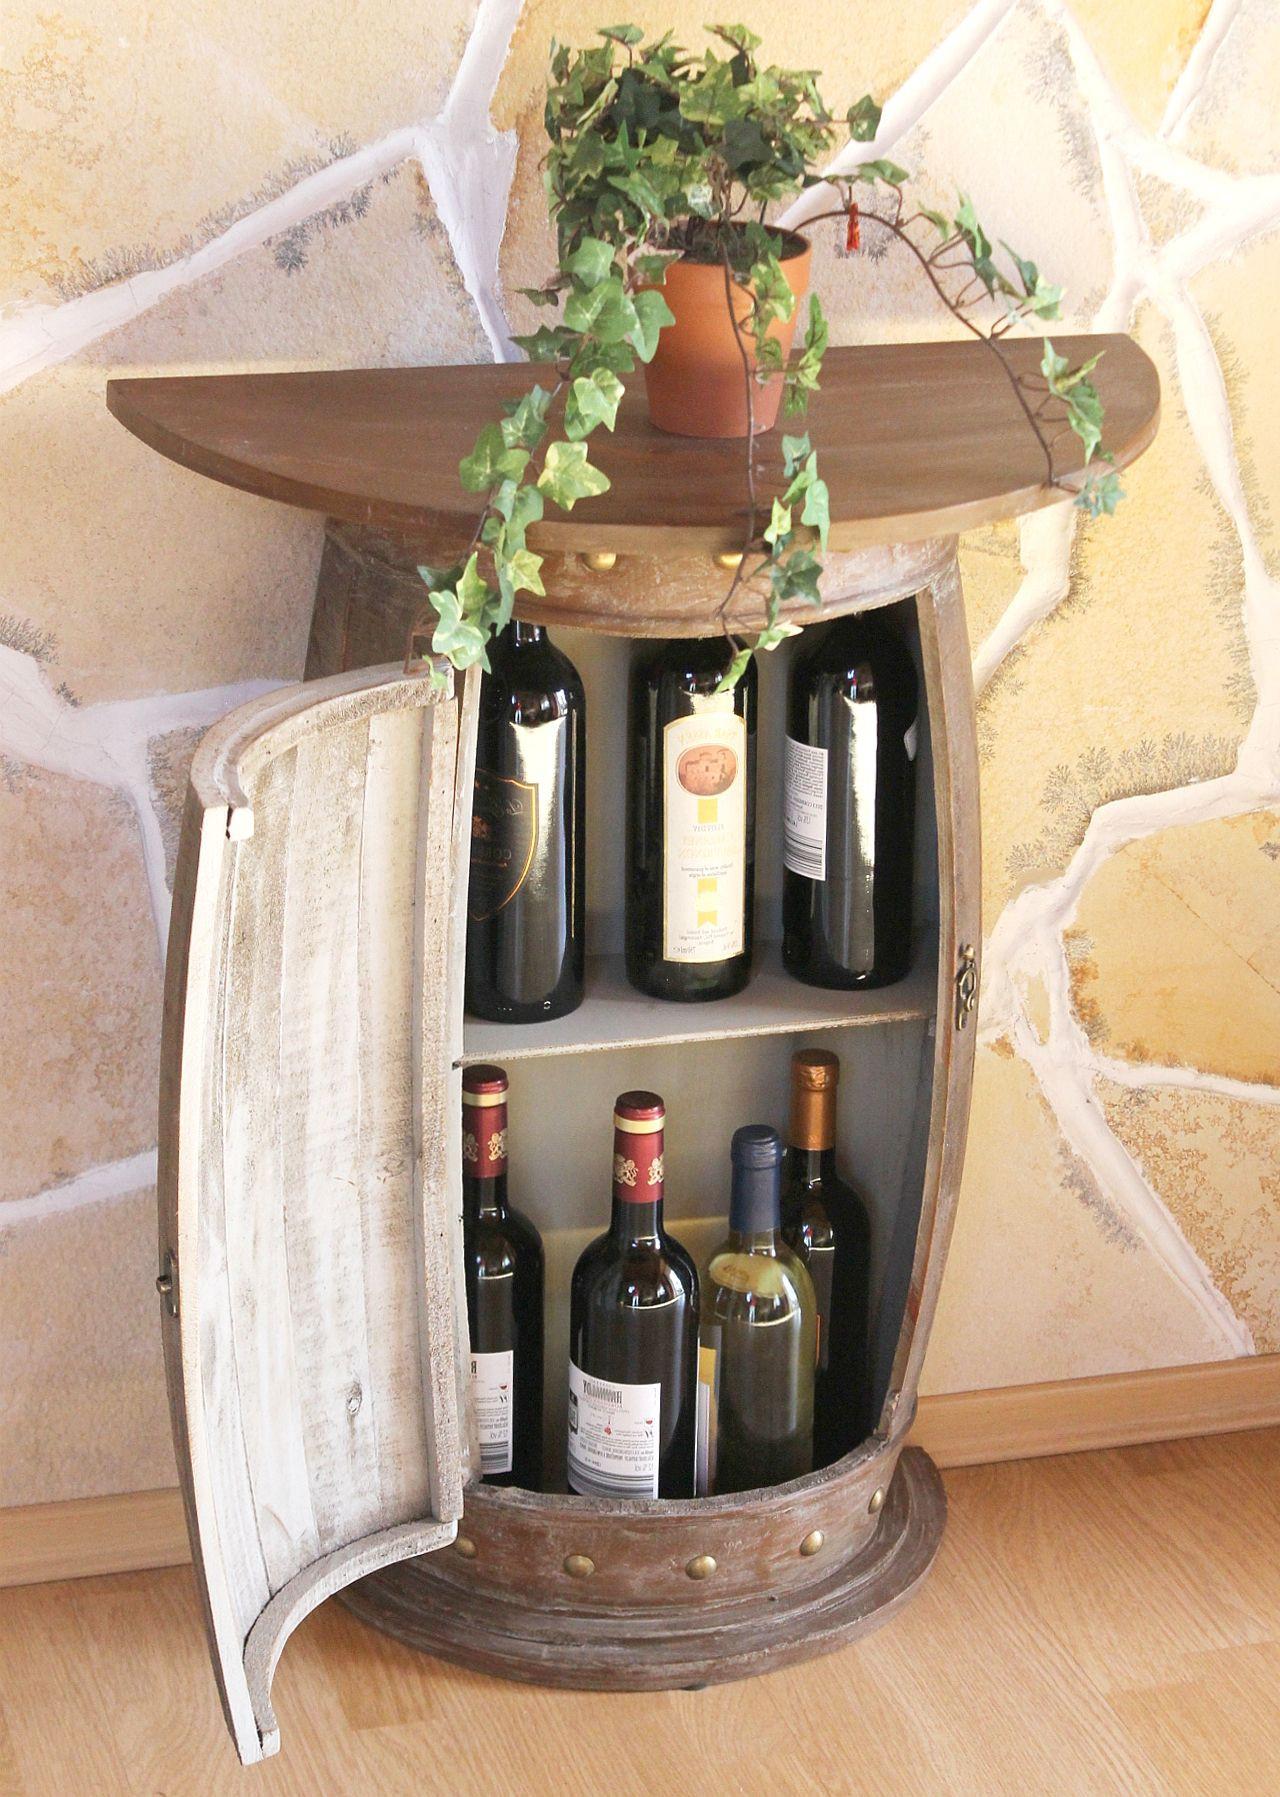 Wandtisch Tisch Weinfass 0373 R Braun Schrank Weinregal Fass 73cm Beistelltisch Dandibo